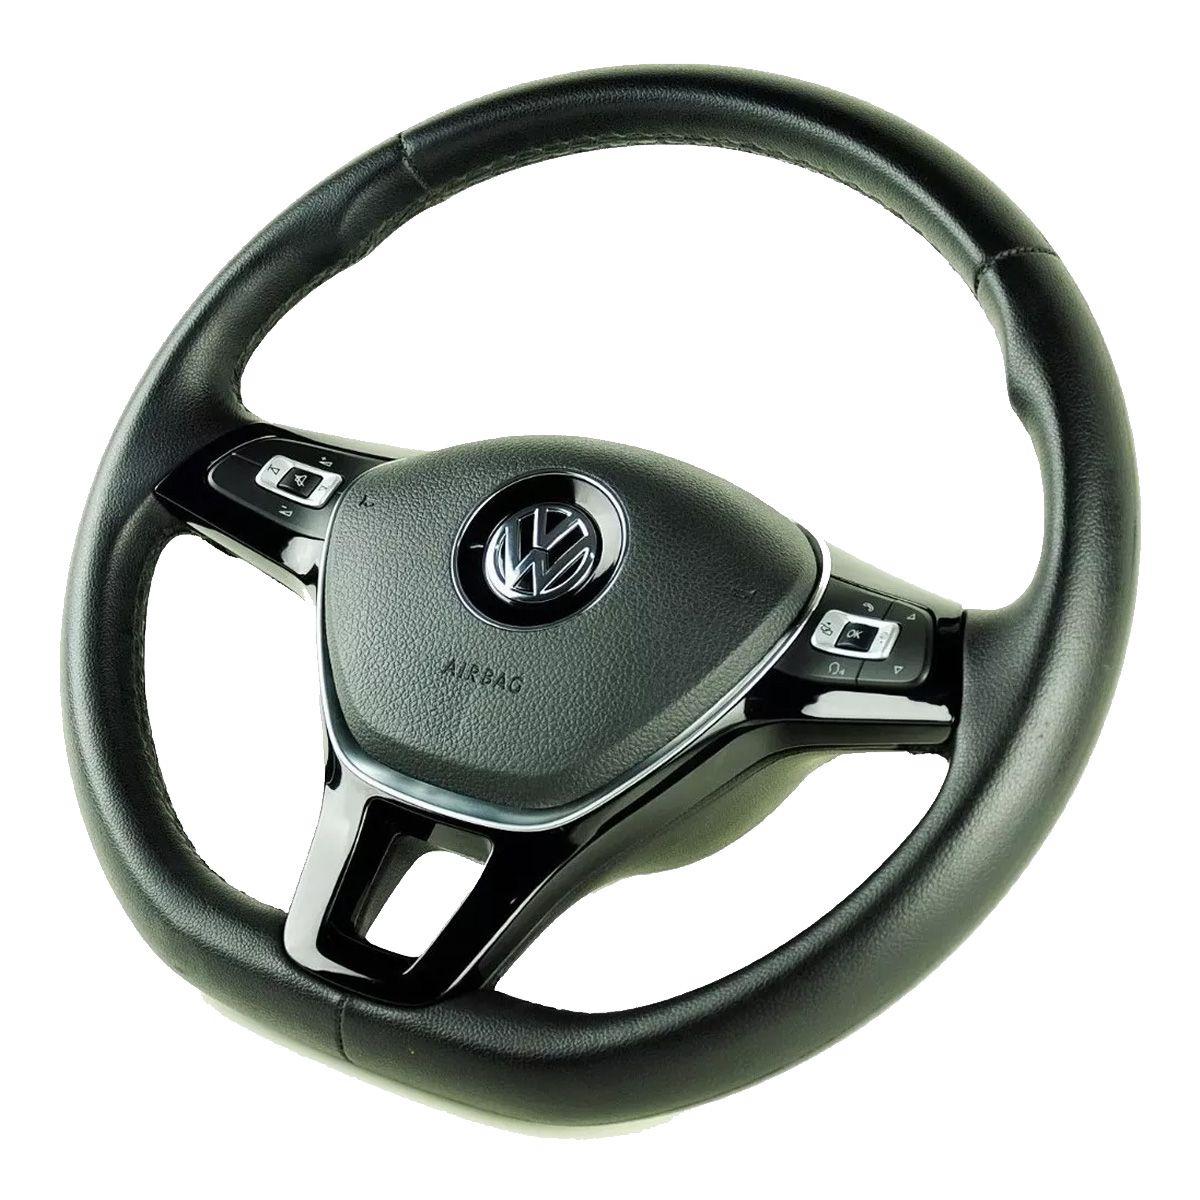 Volante Multifuncional Gti Mk7 G7 Tsi Gol G2 G3 G4 G5 G6 Saveiro Parati Santana Voyage Fox Golf Comandos Controle de Som Led Tampa Acionador de Buzina + Cubo Volkswagen